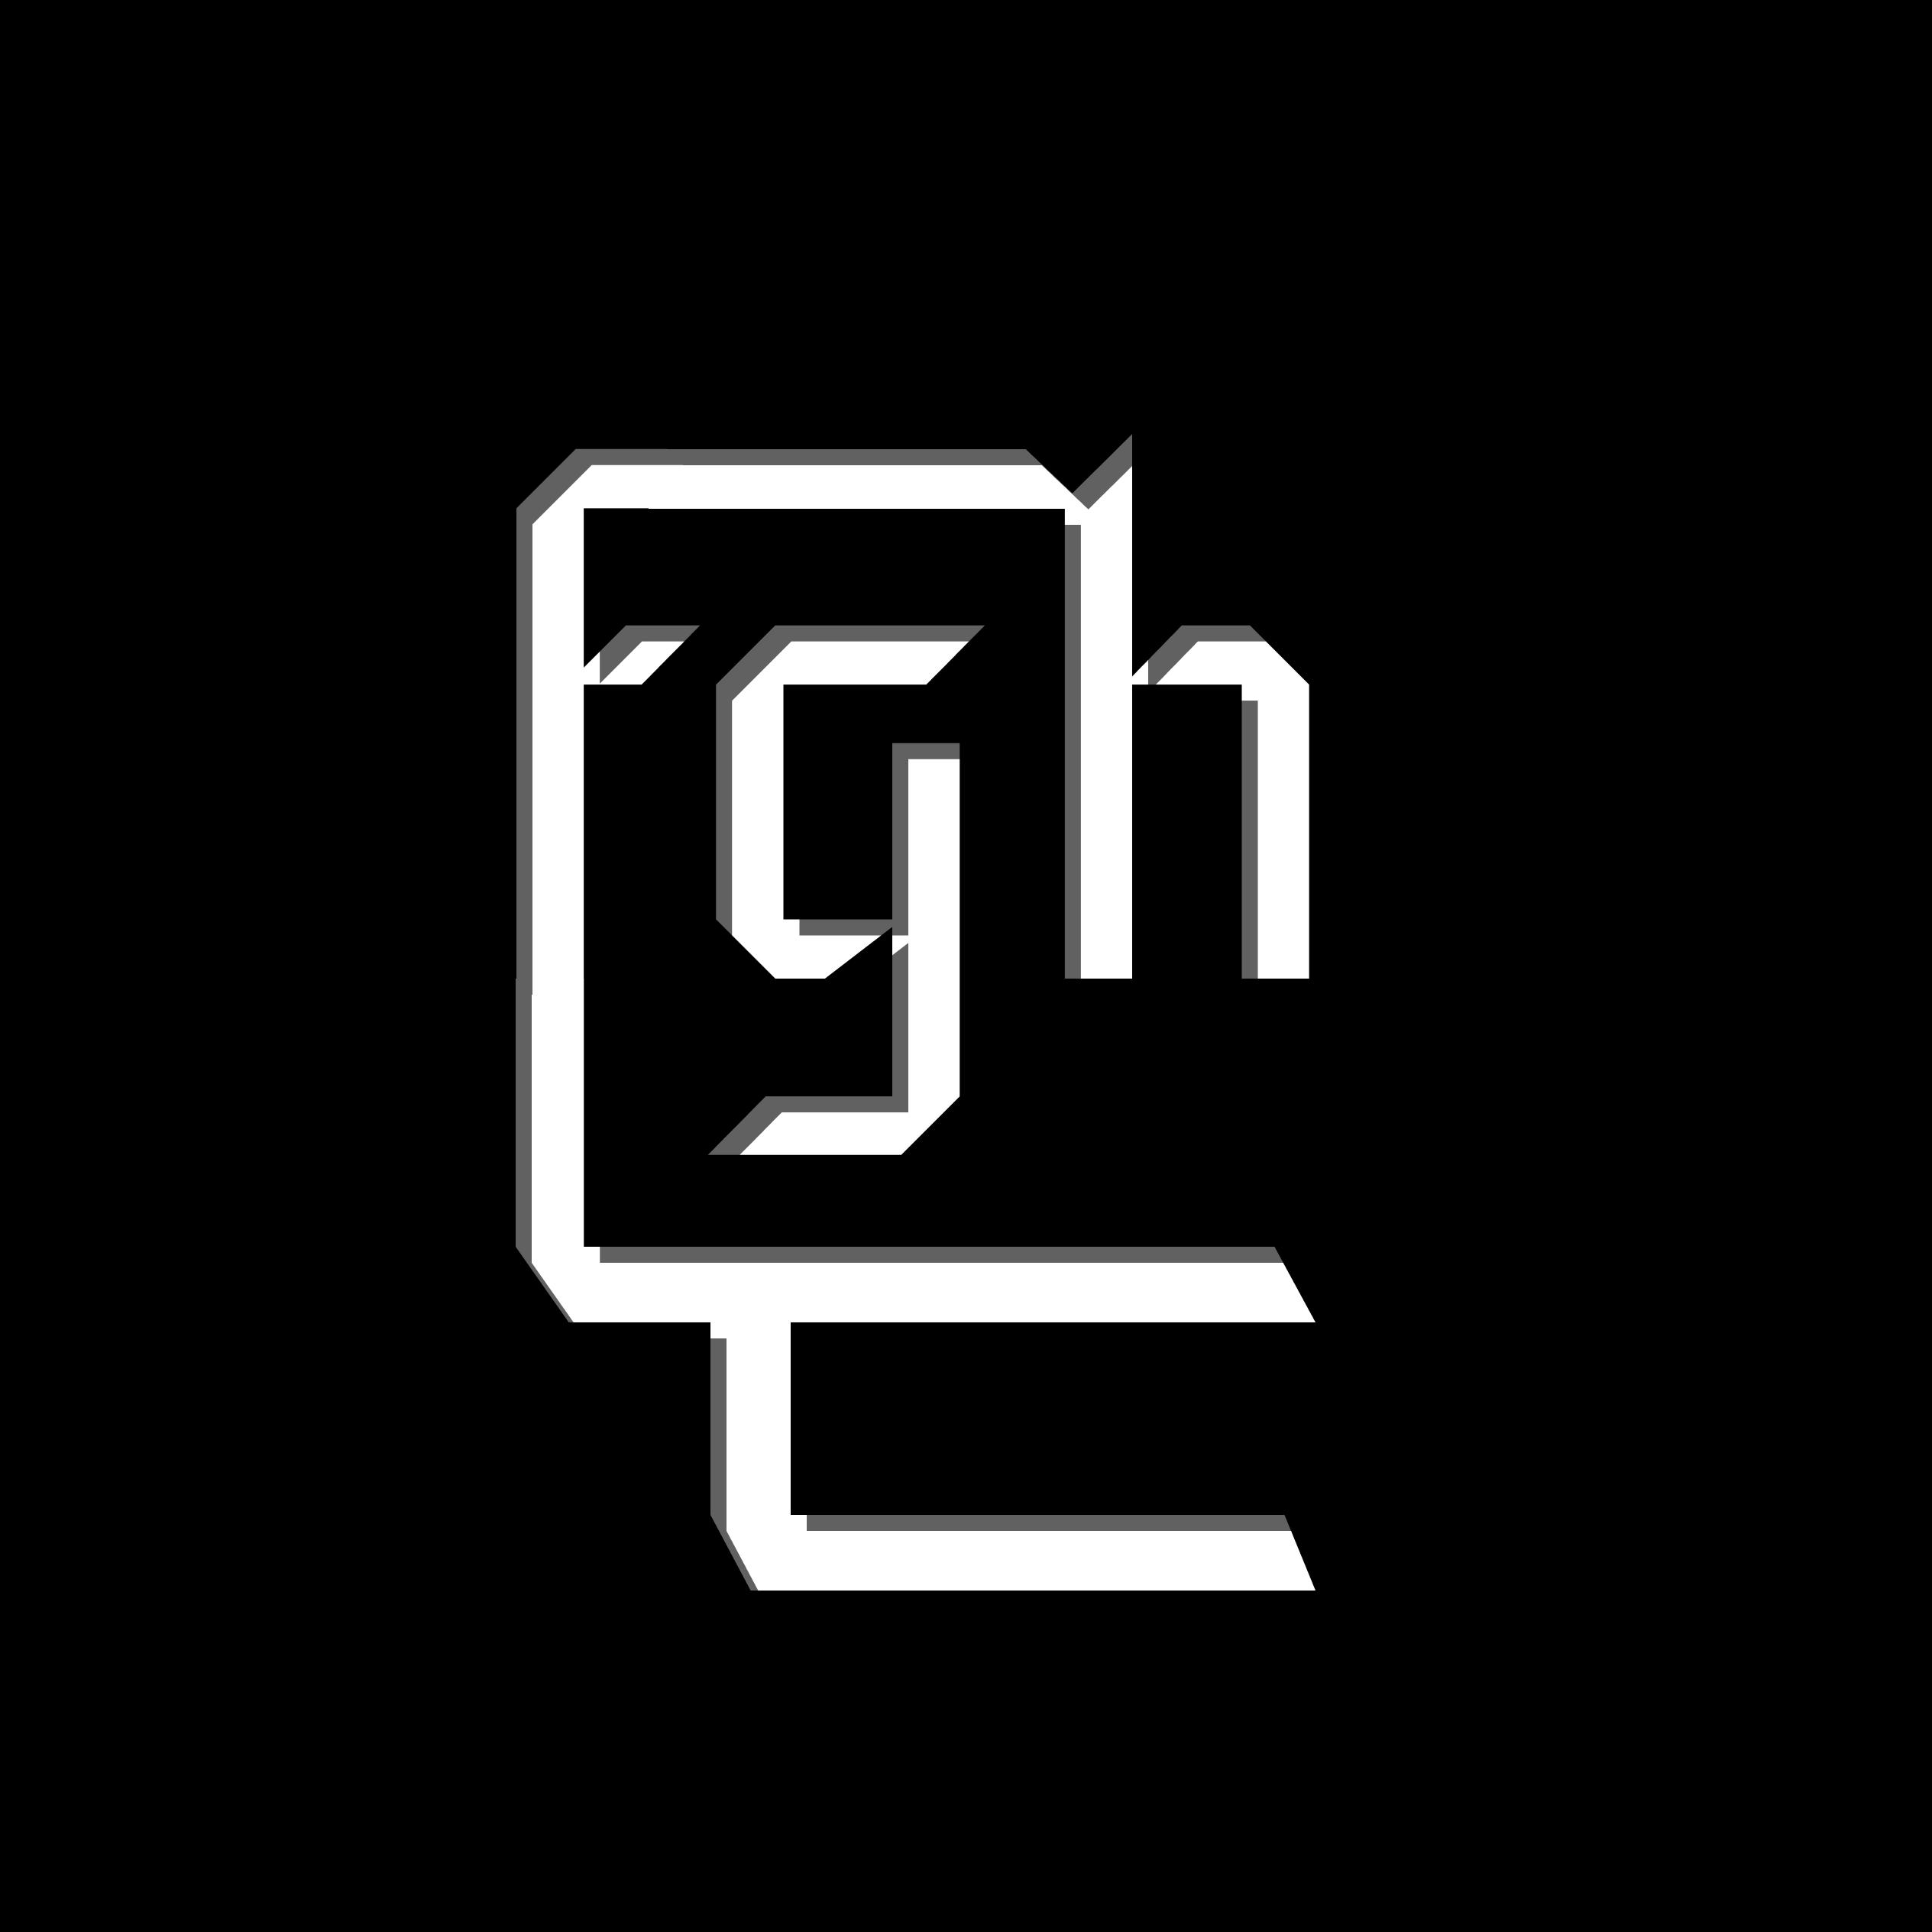 https://cloud-k4200atnu.vercel.app/0entire_logo.png